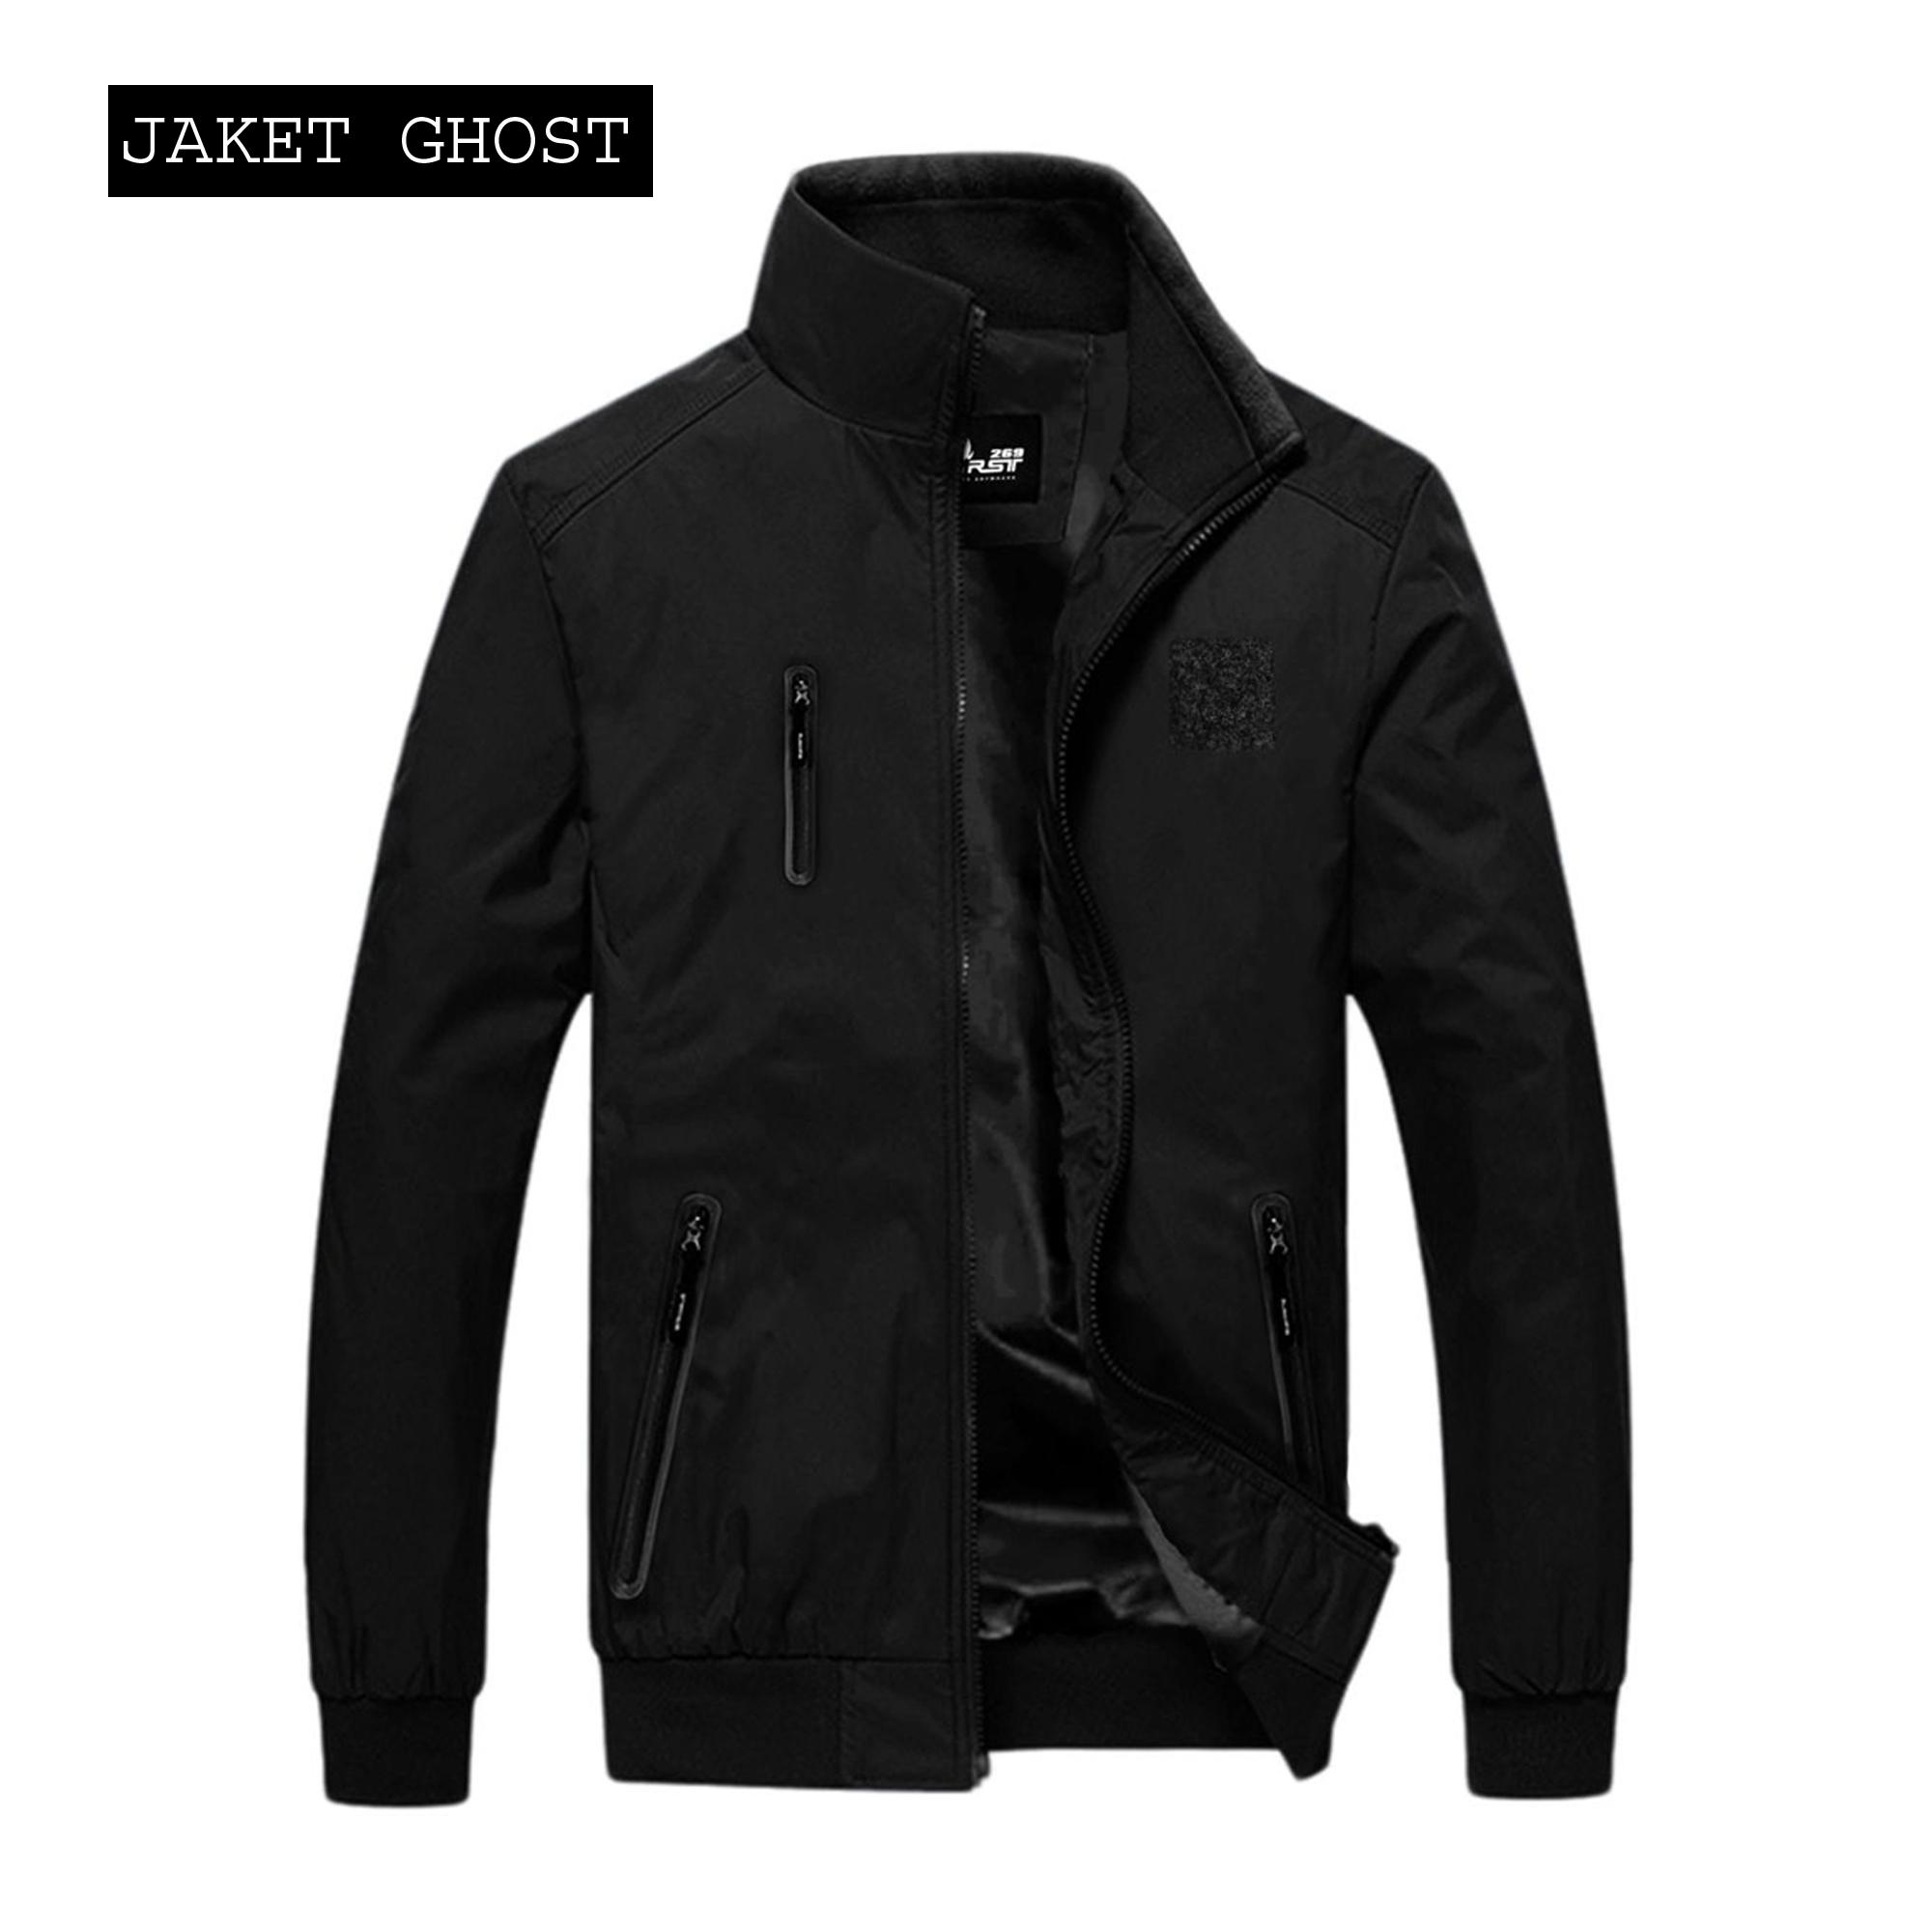 Jaket Pria / Jaket Unisex / Jaket Elegant / Jaket Casual / Jaket Premium / Jaket Indonesia - Wp Black Ghost Indonesia